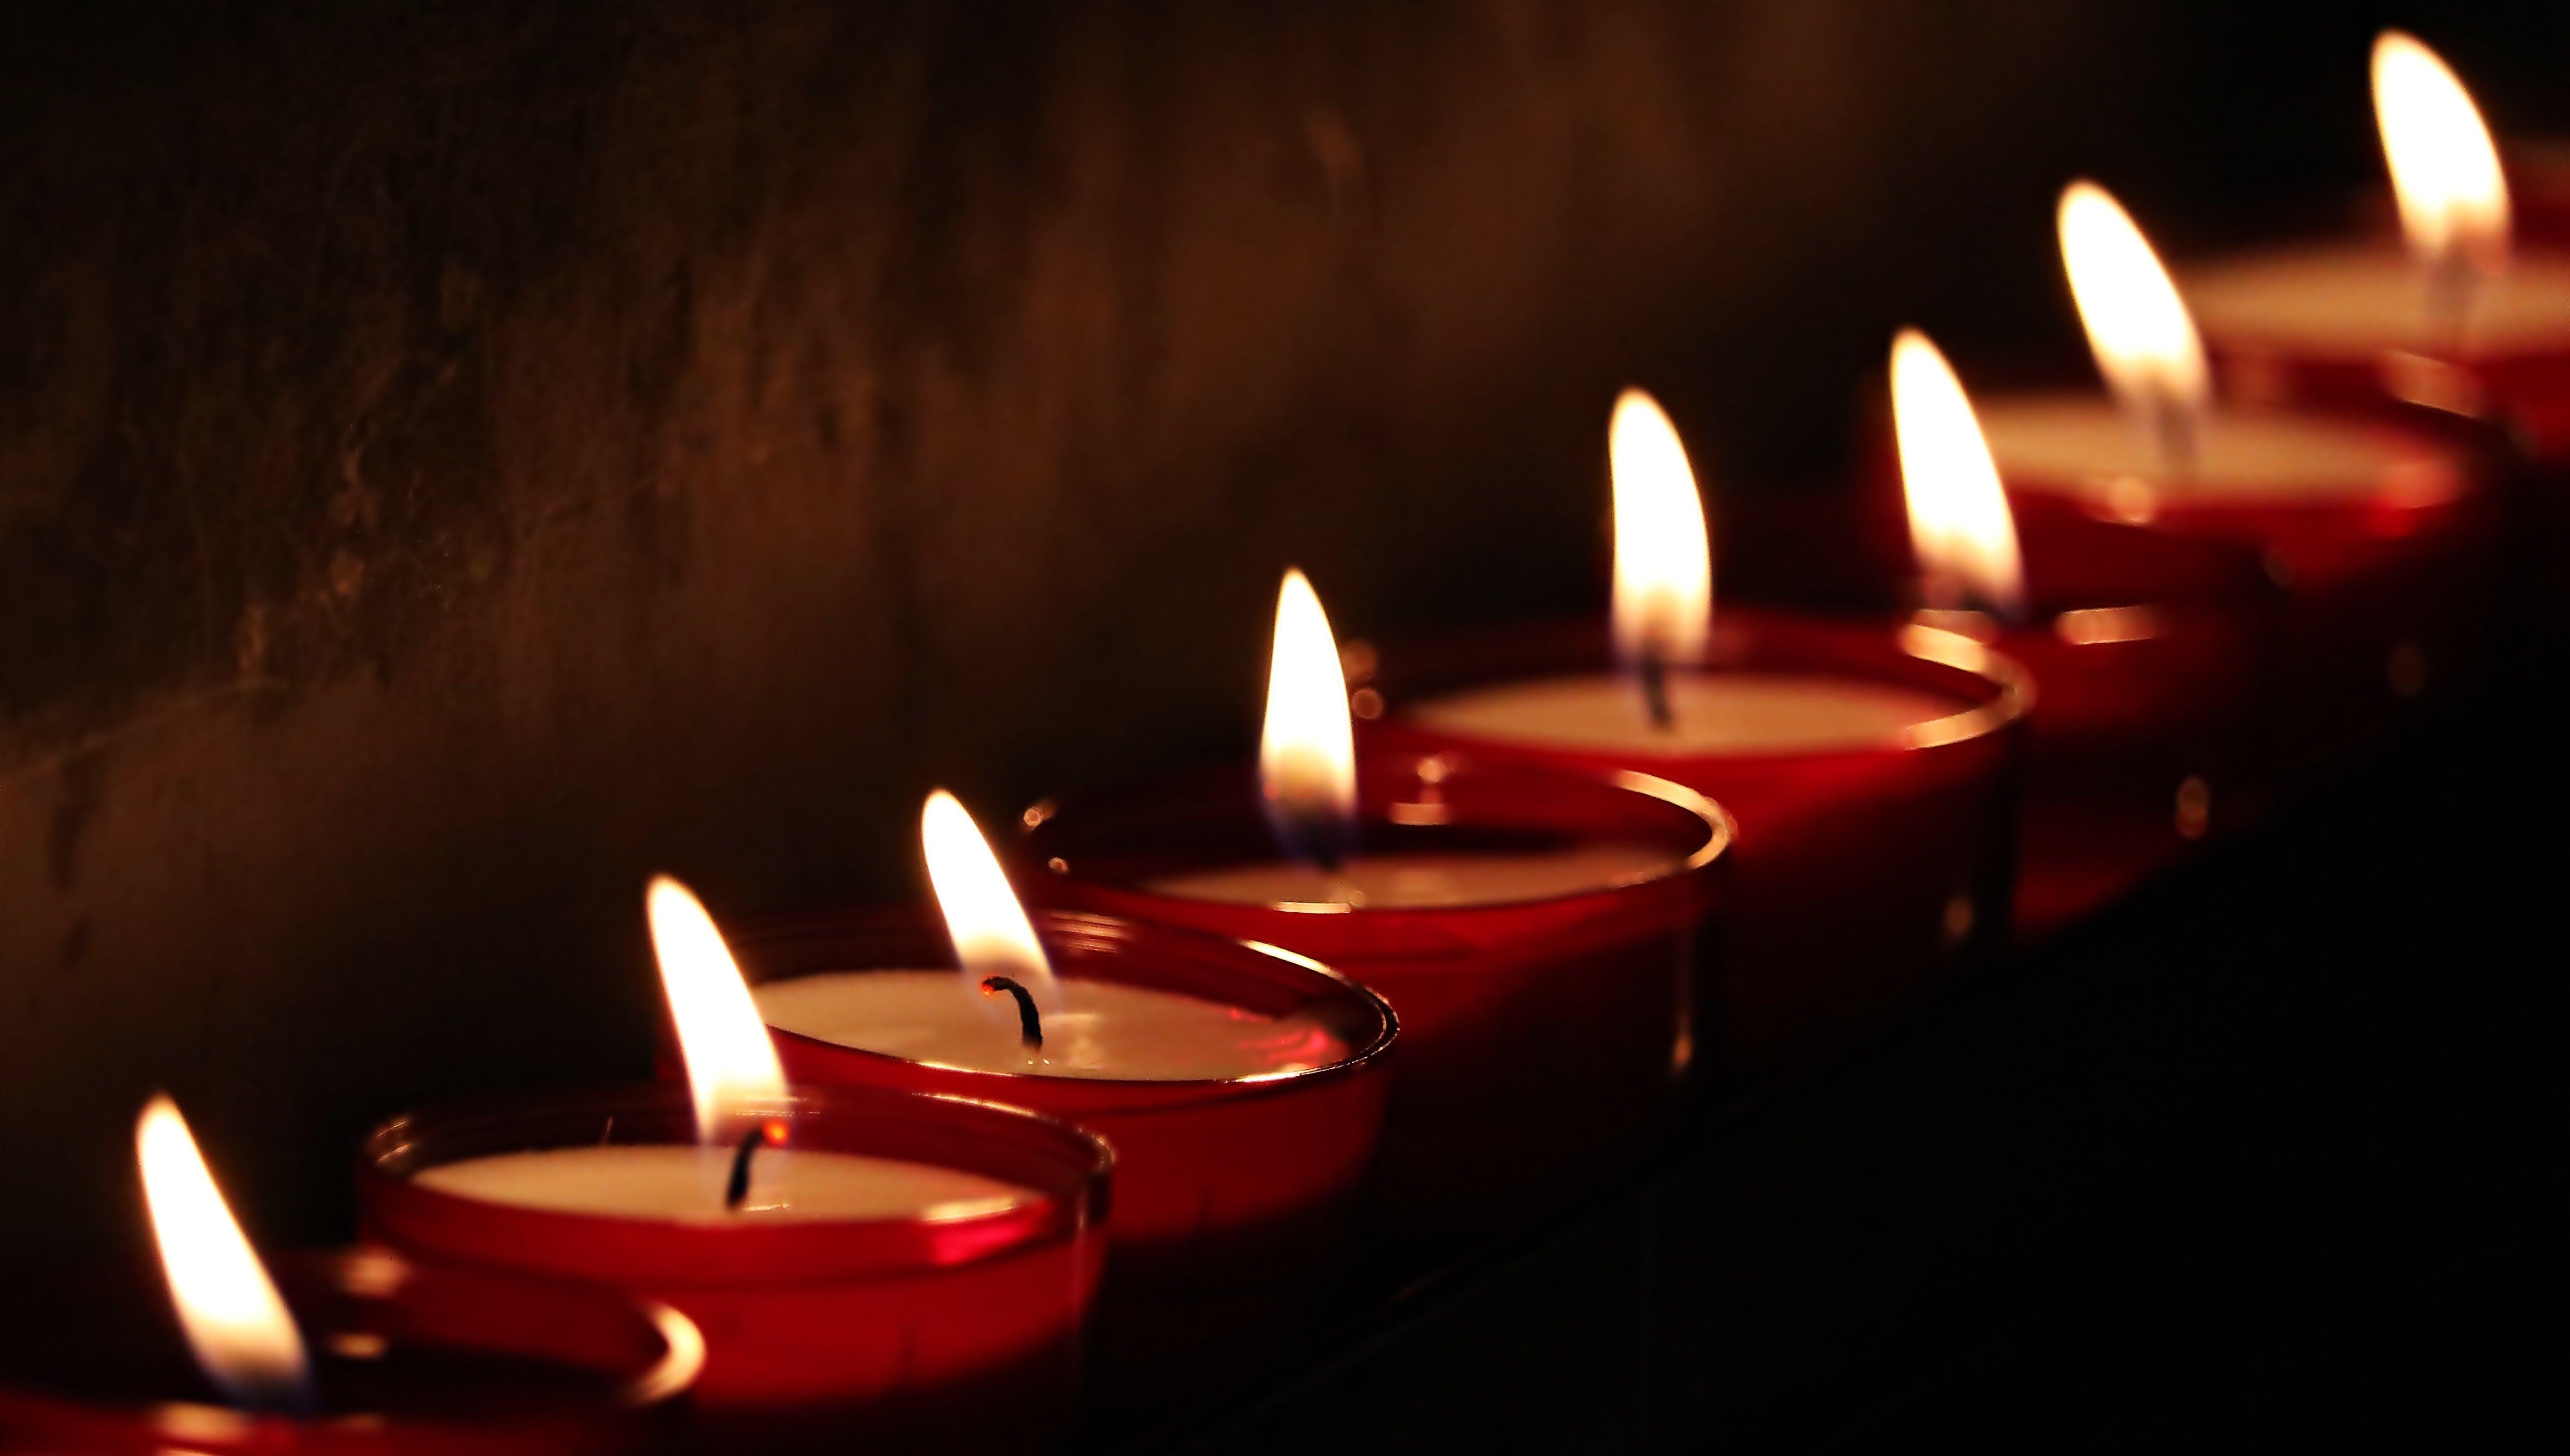 blur, burning, candlelight